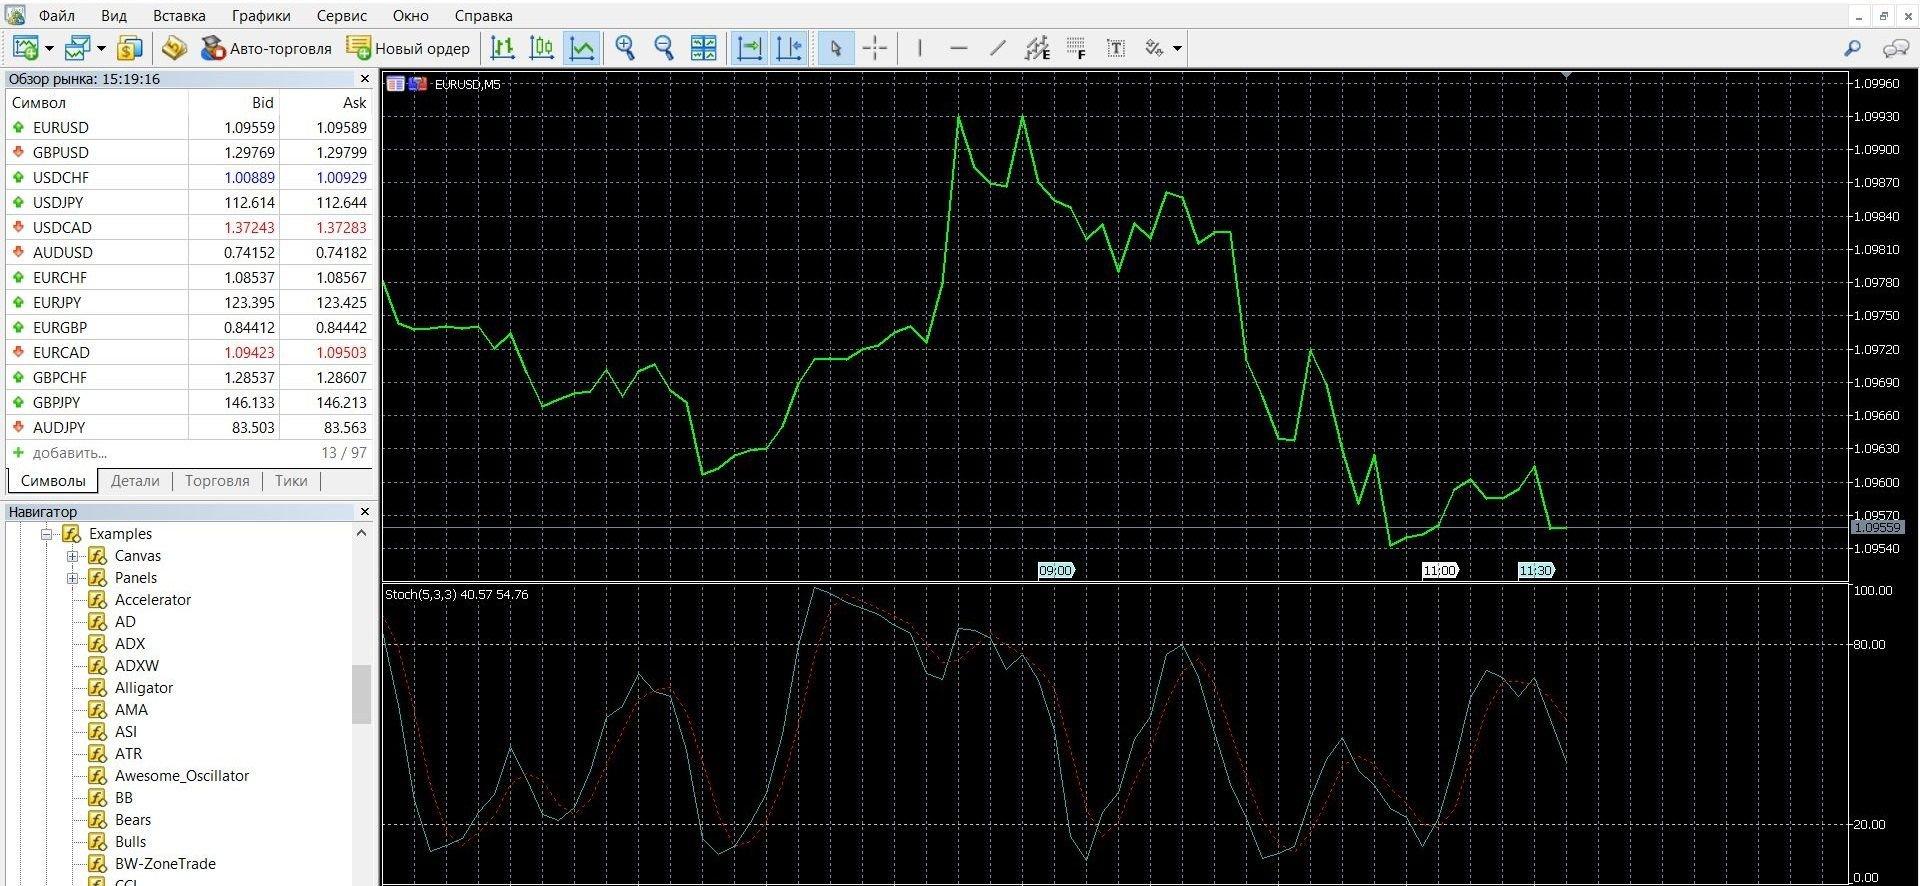 Индикатор Стохастик Индекс силы (StochRSI)